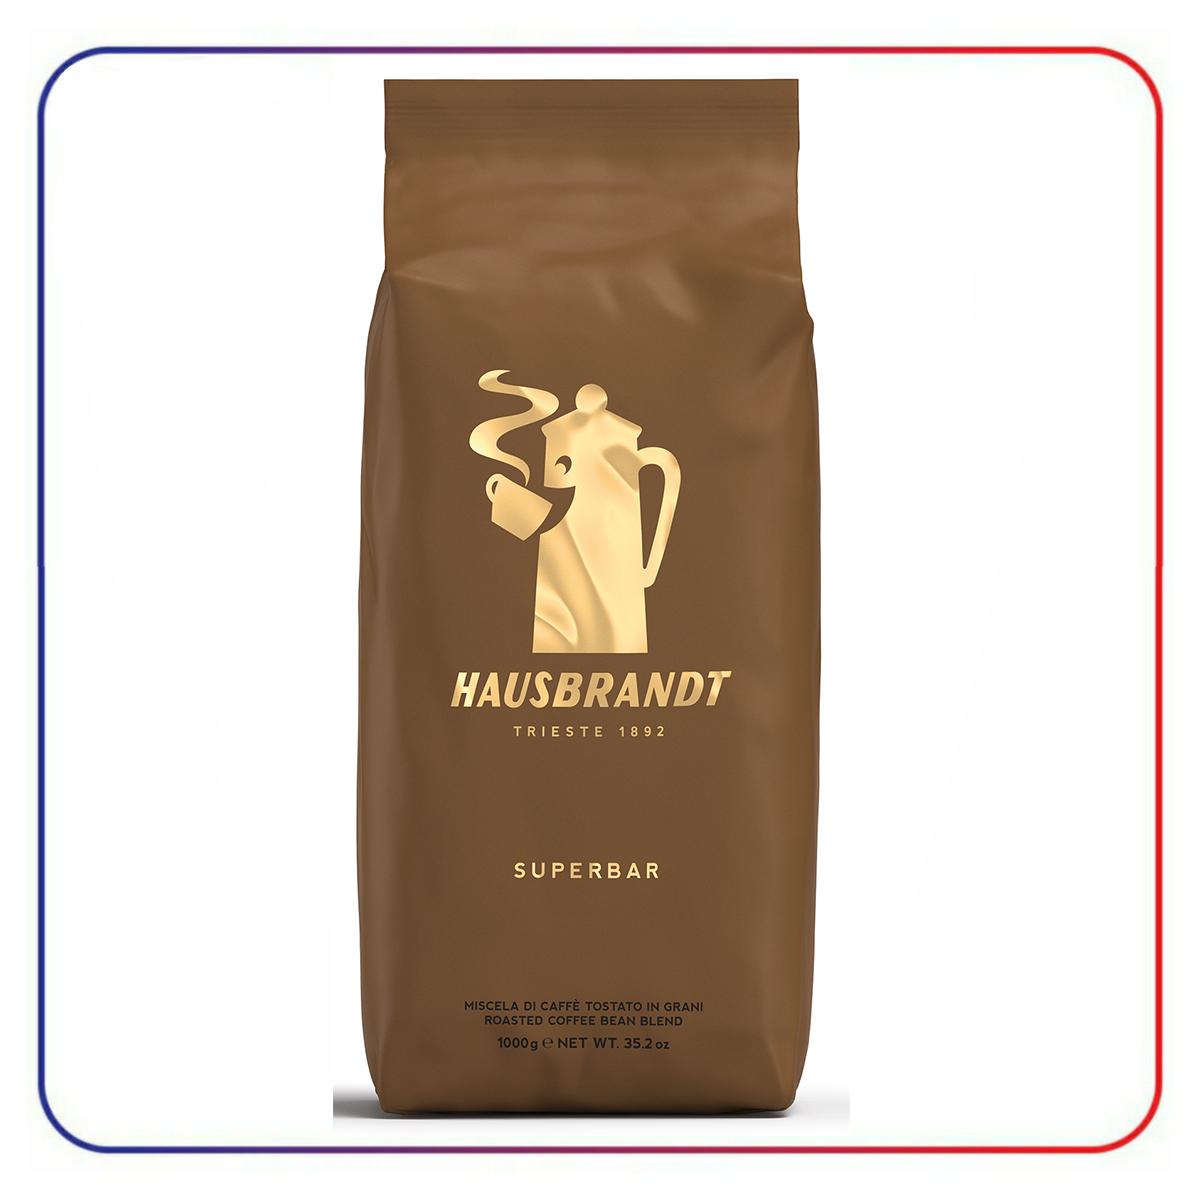 دانه قهوه هاوس برنت سوپر بار HAUSBRANDT SUPER BAR